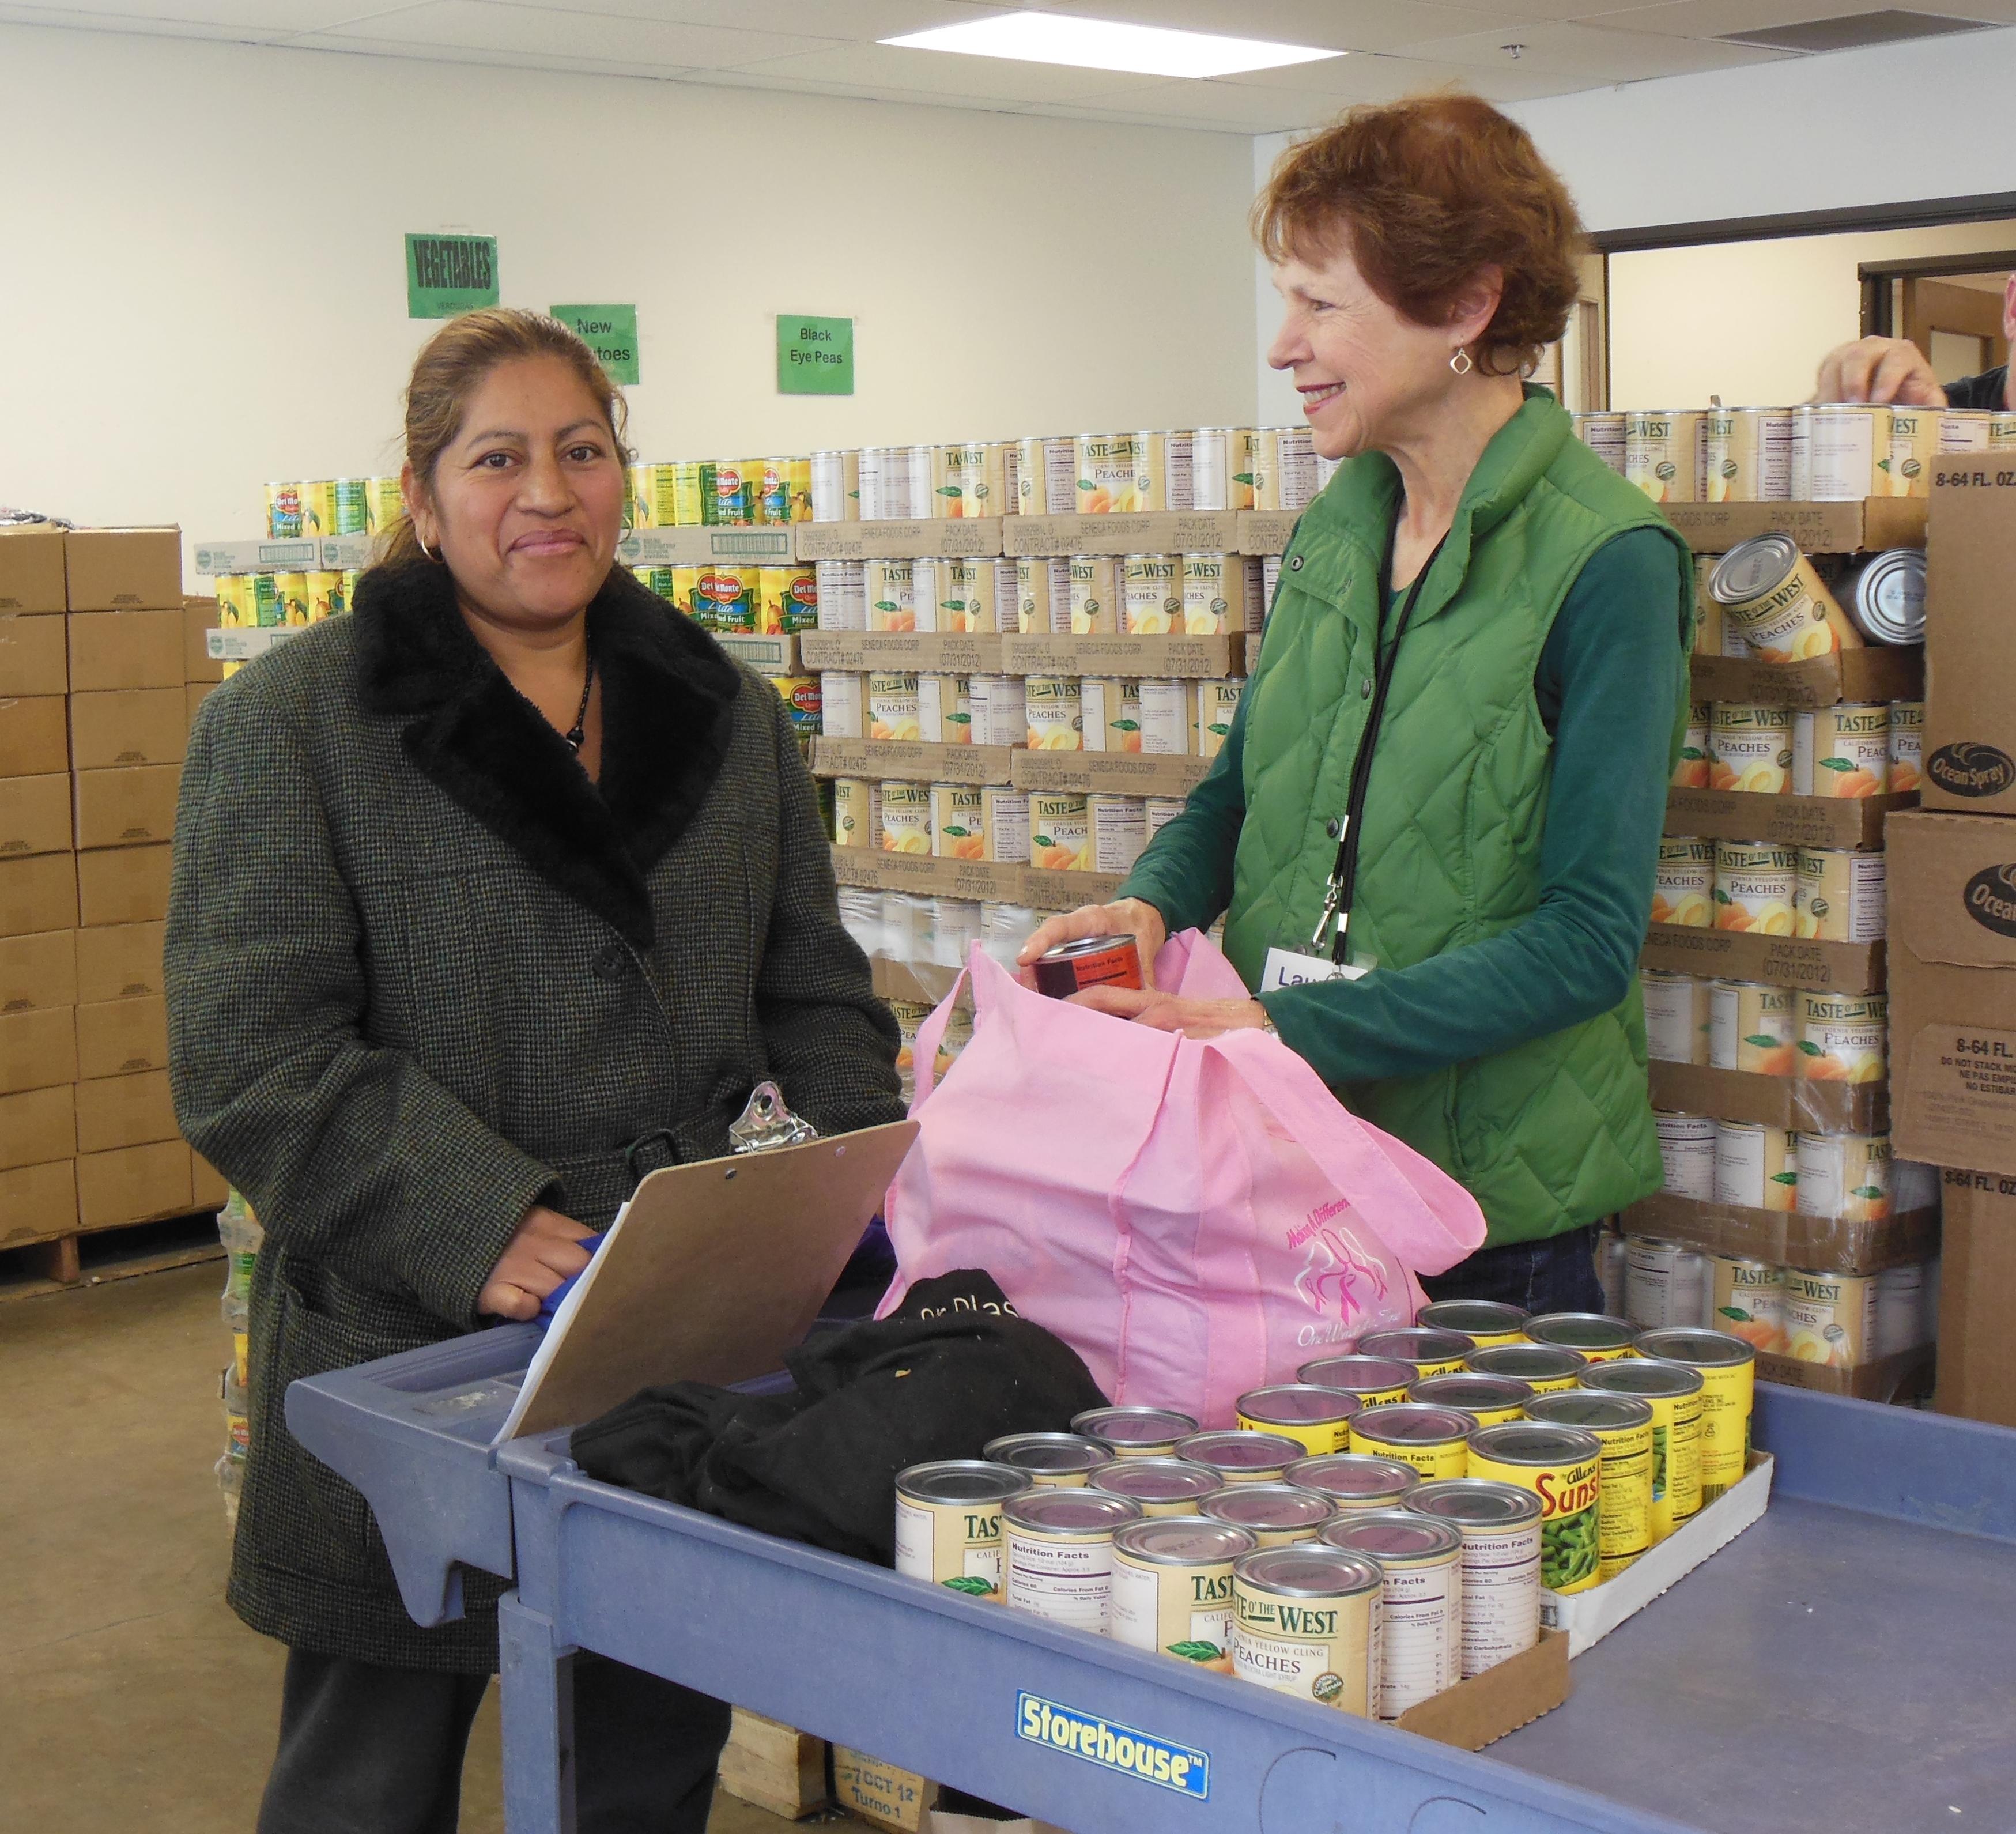 Community Service Organization - Crossroads Community Services  4